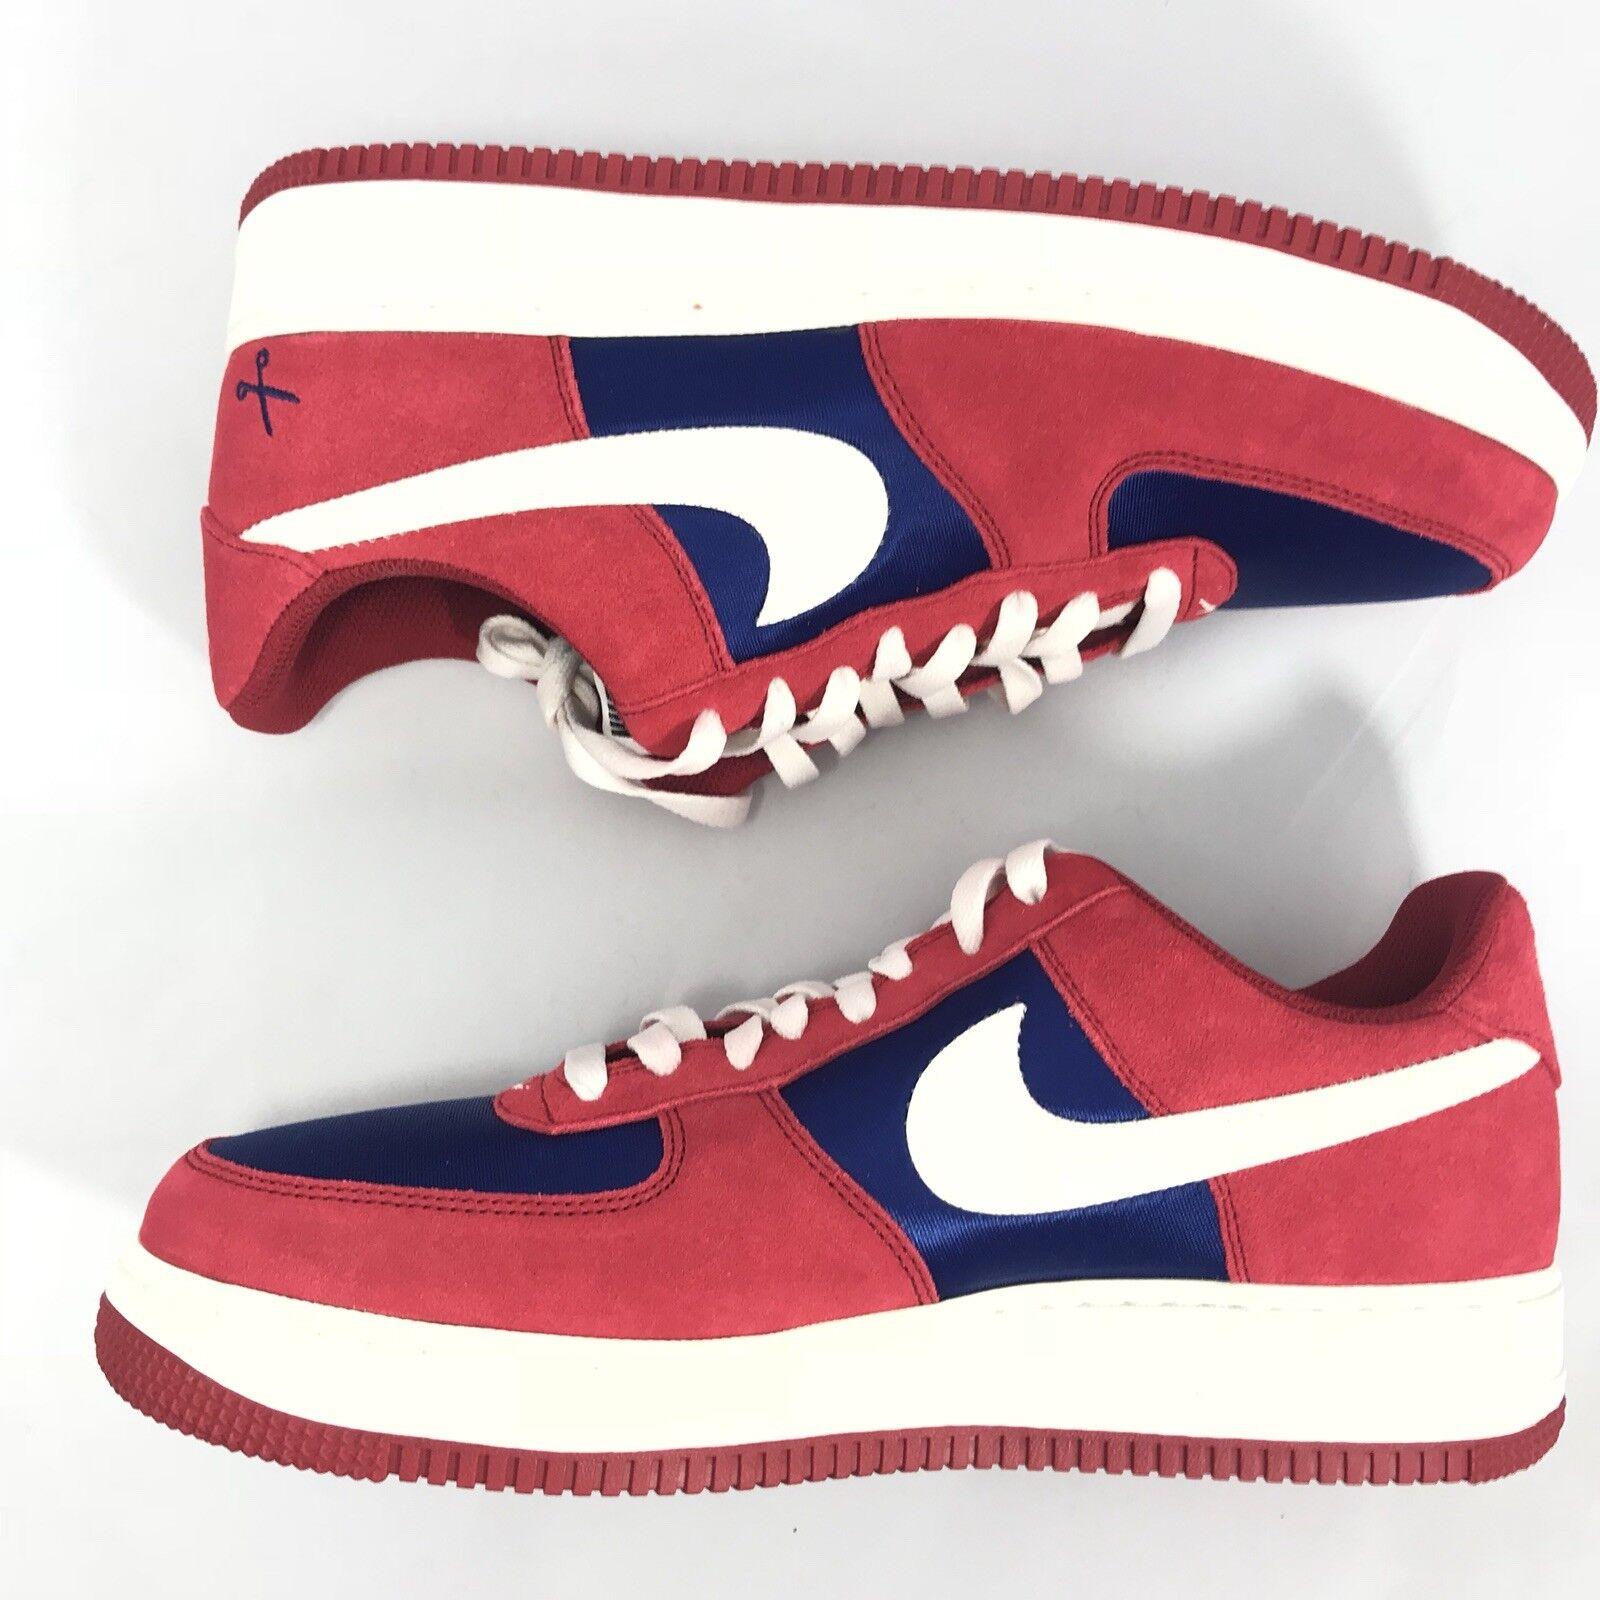 Nike air force 1 basso Uomo basket palestra rosso blu reale vela 488298-626 sz